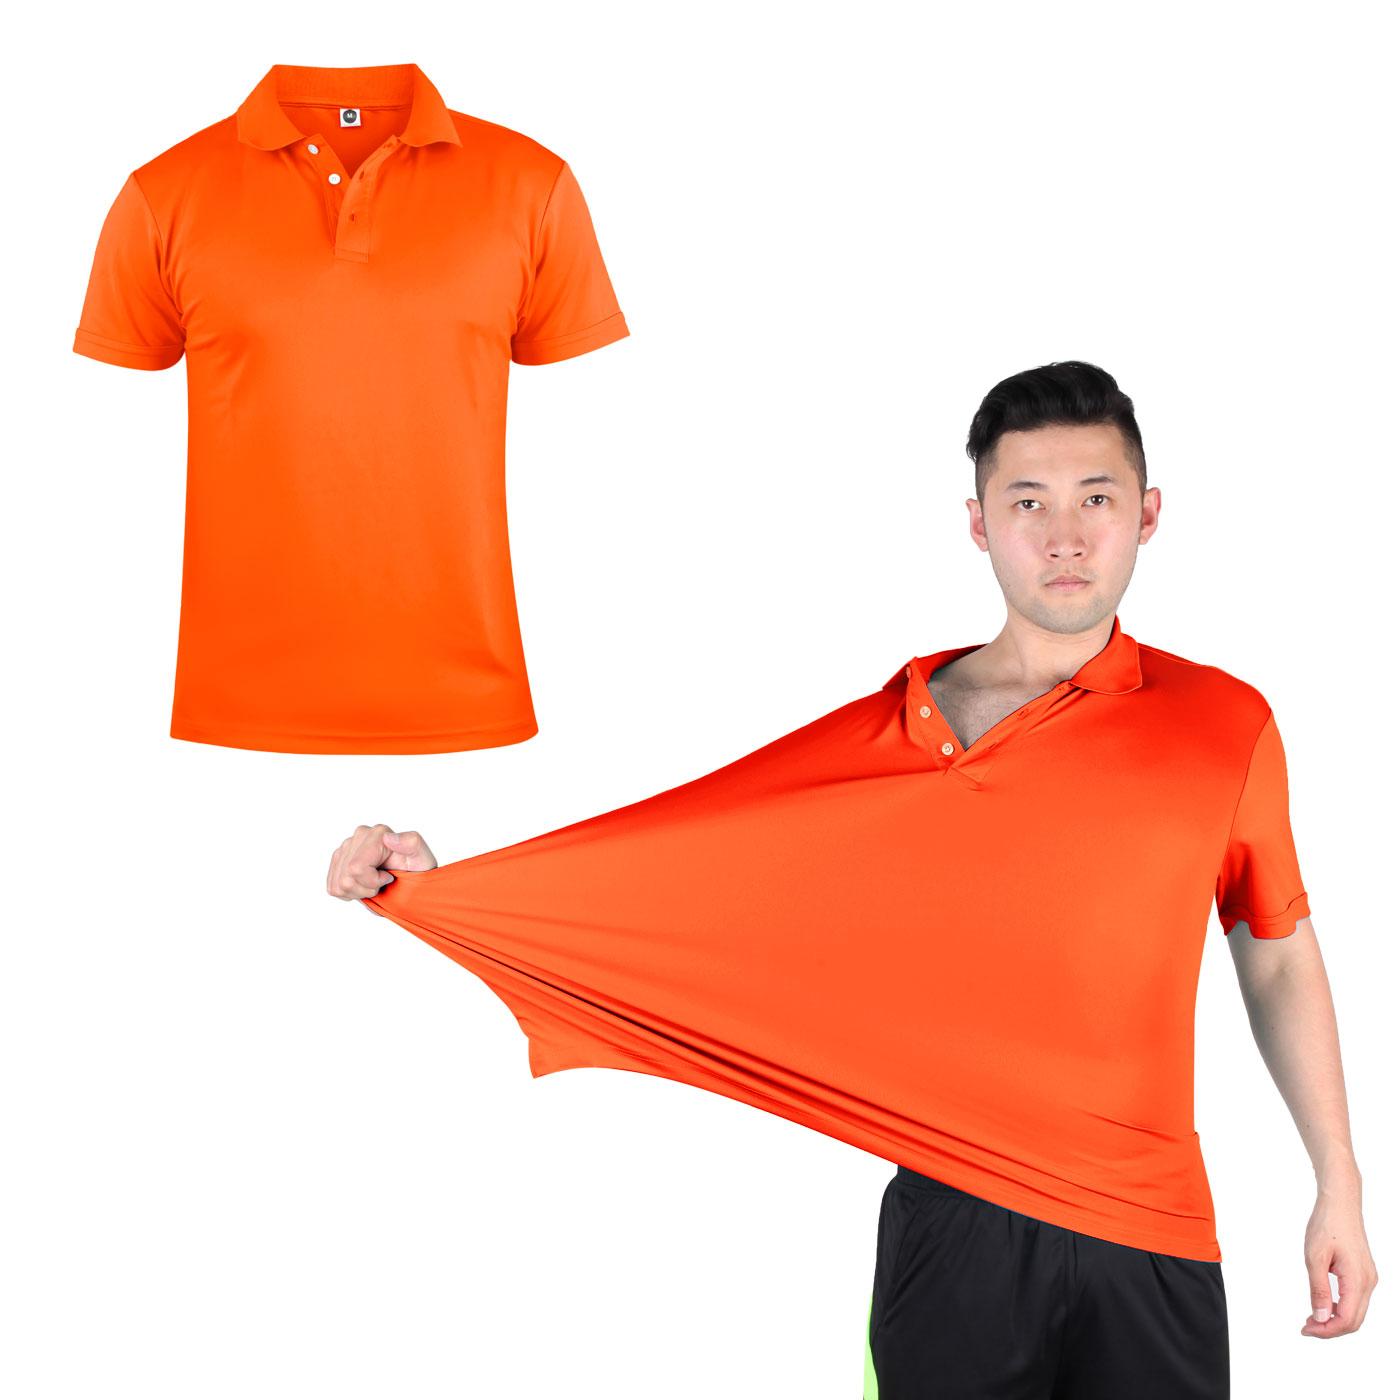 HODARLA 彈力涼感短袖POLO衫 3113901 - 螢光橘